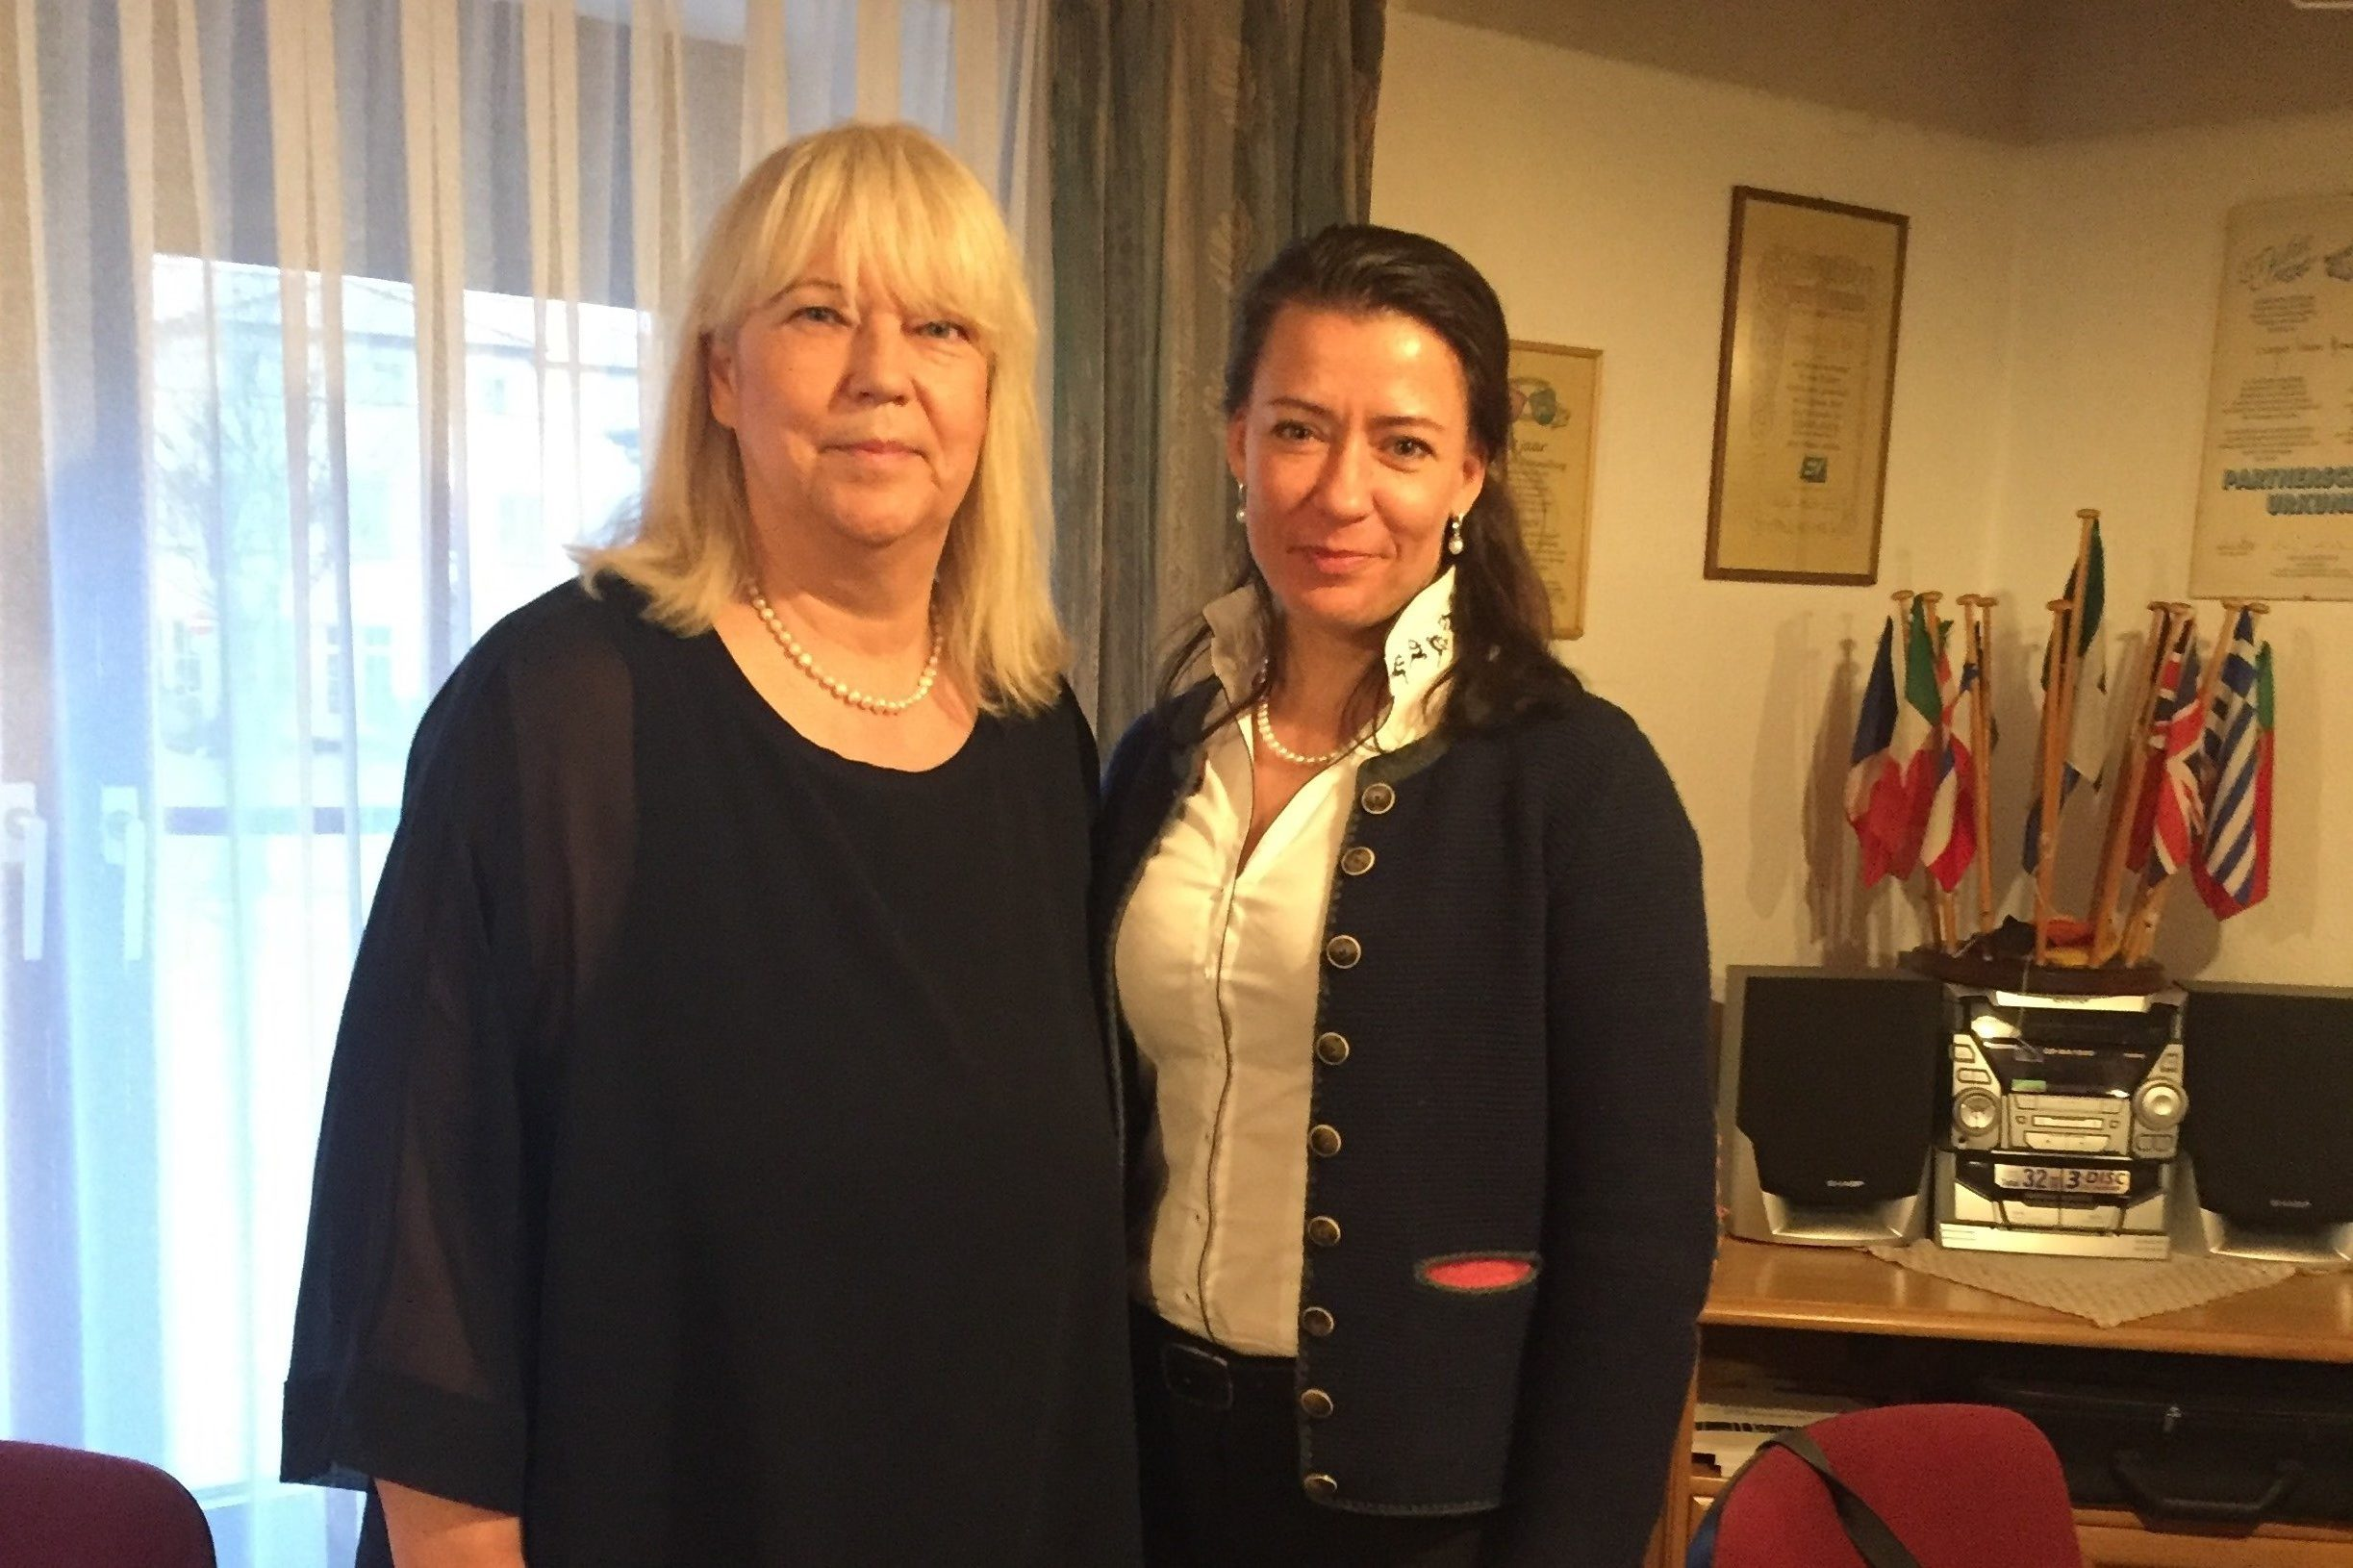 Frauenforum Mit Frau Dr Claudia Conen Aus Thuringen Kreisverband Hammelburg E V